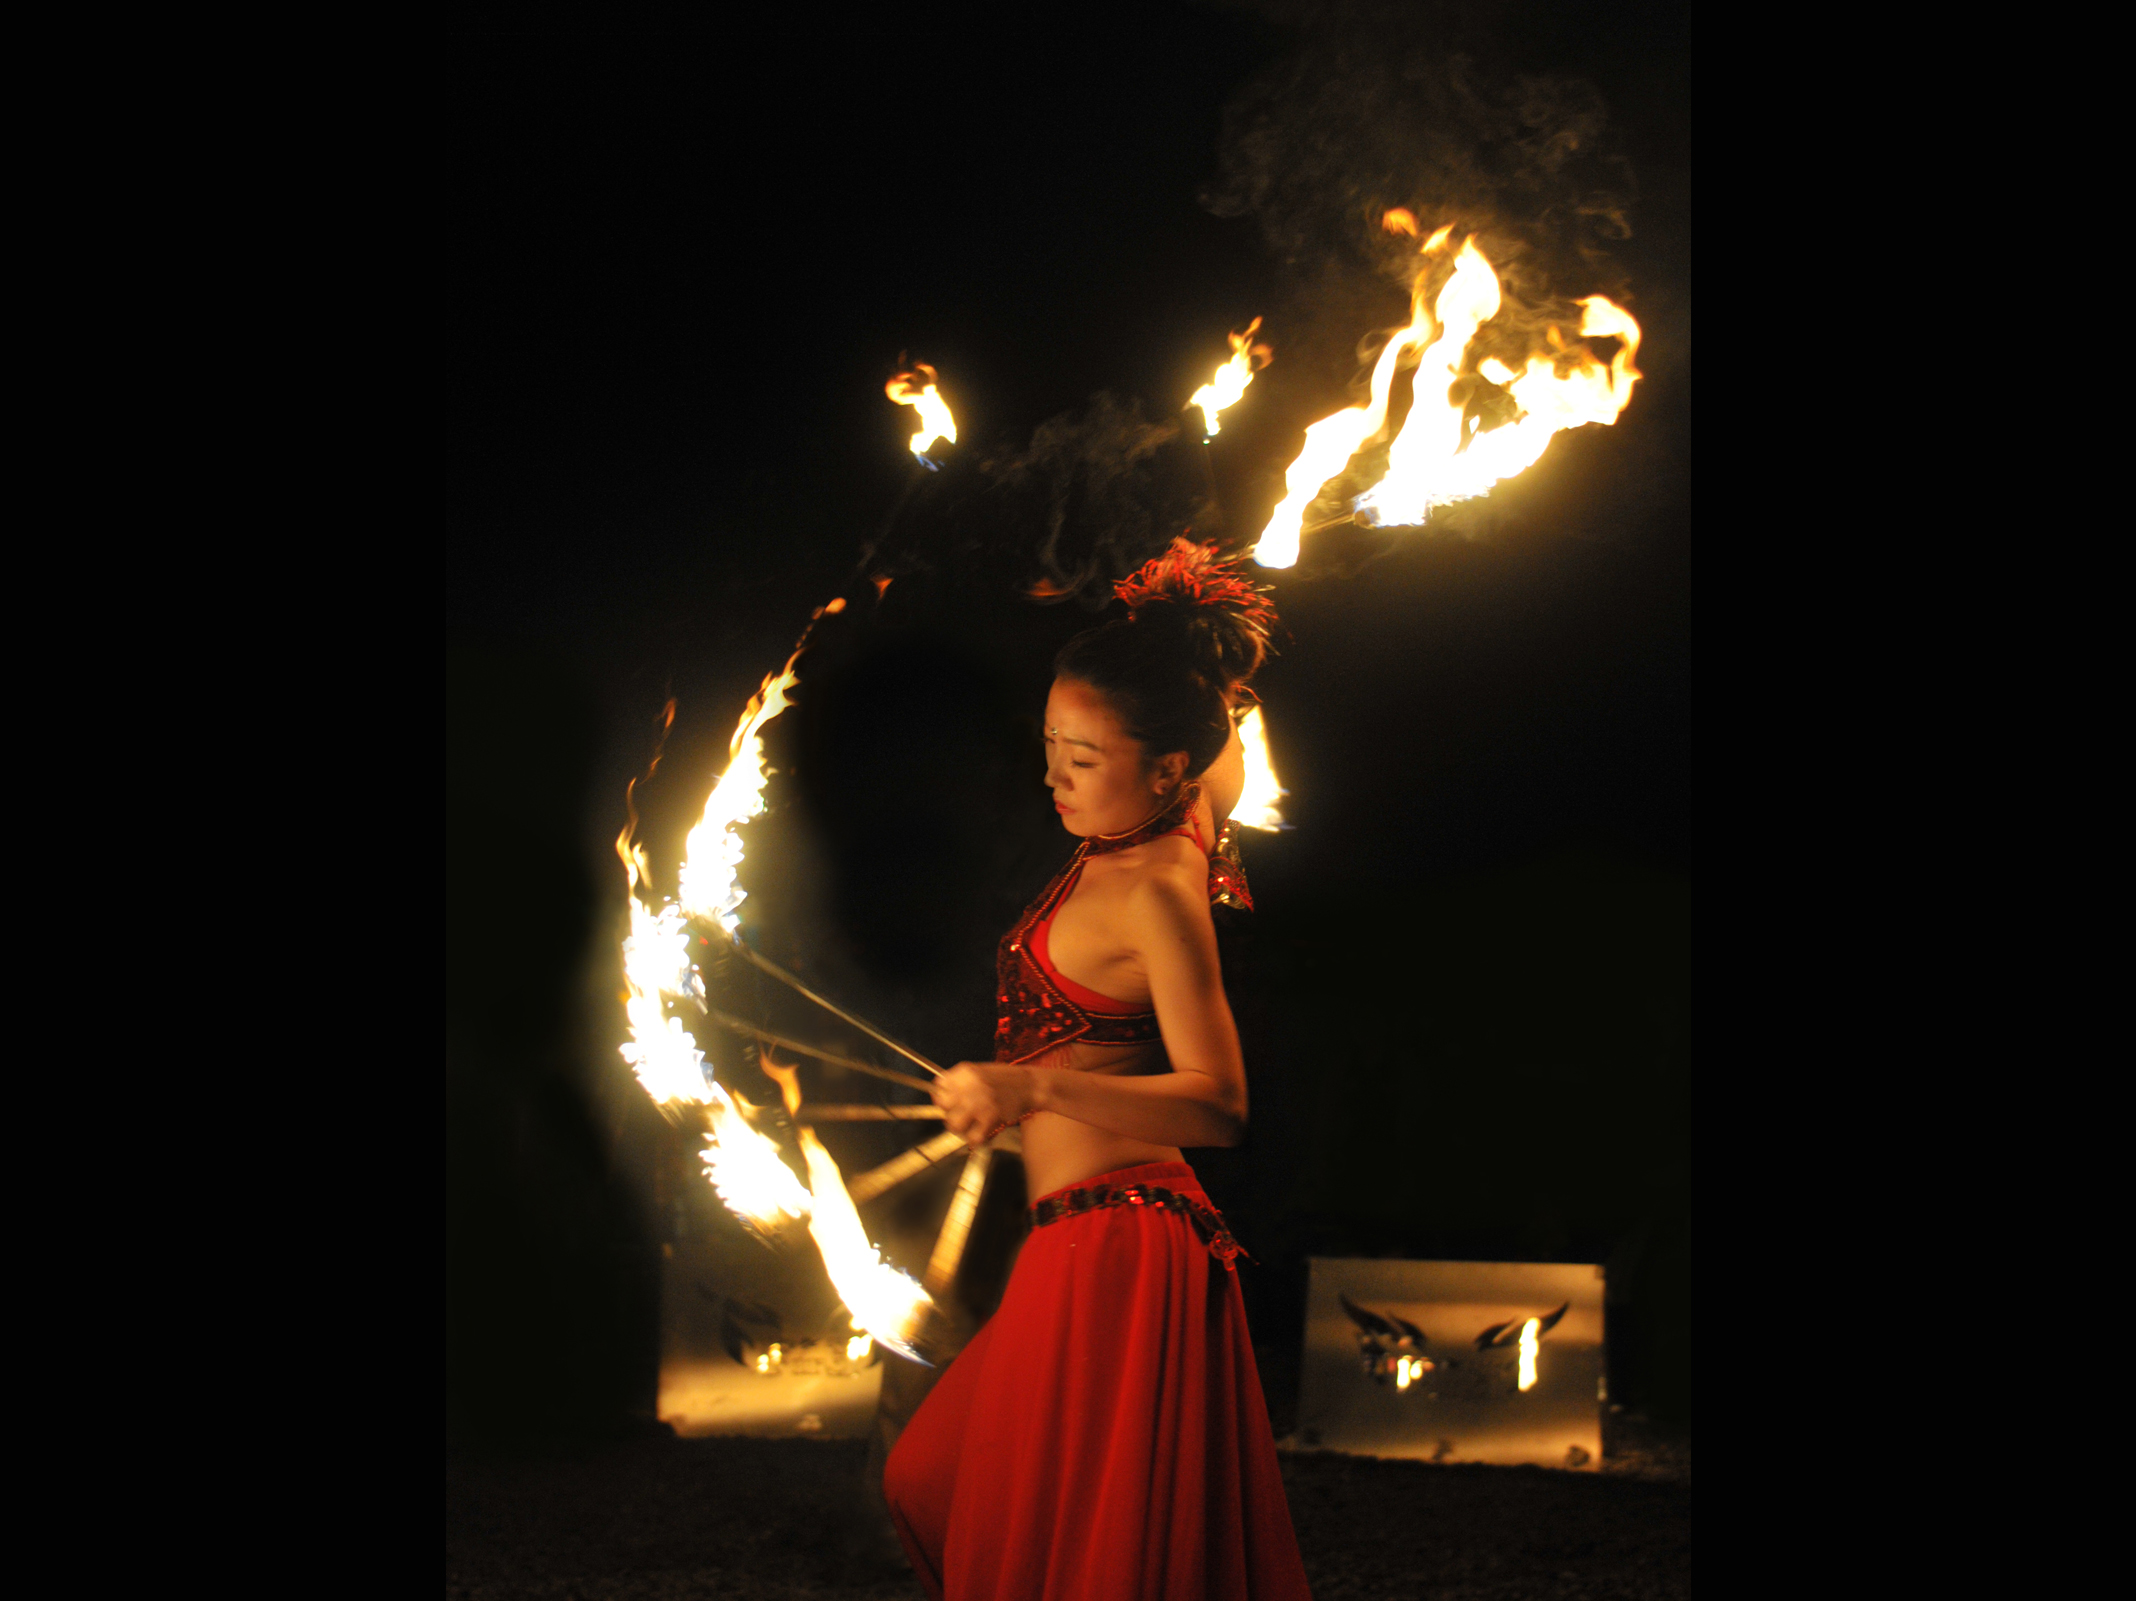 Fire Arts_Flaming Fire team_yoony k  (4)